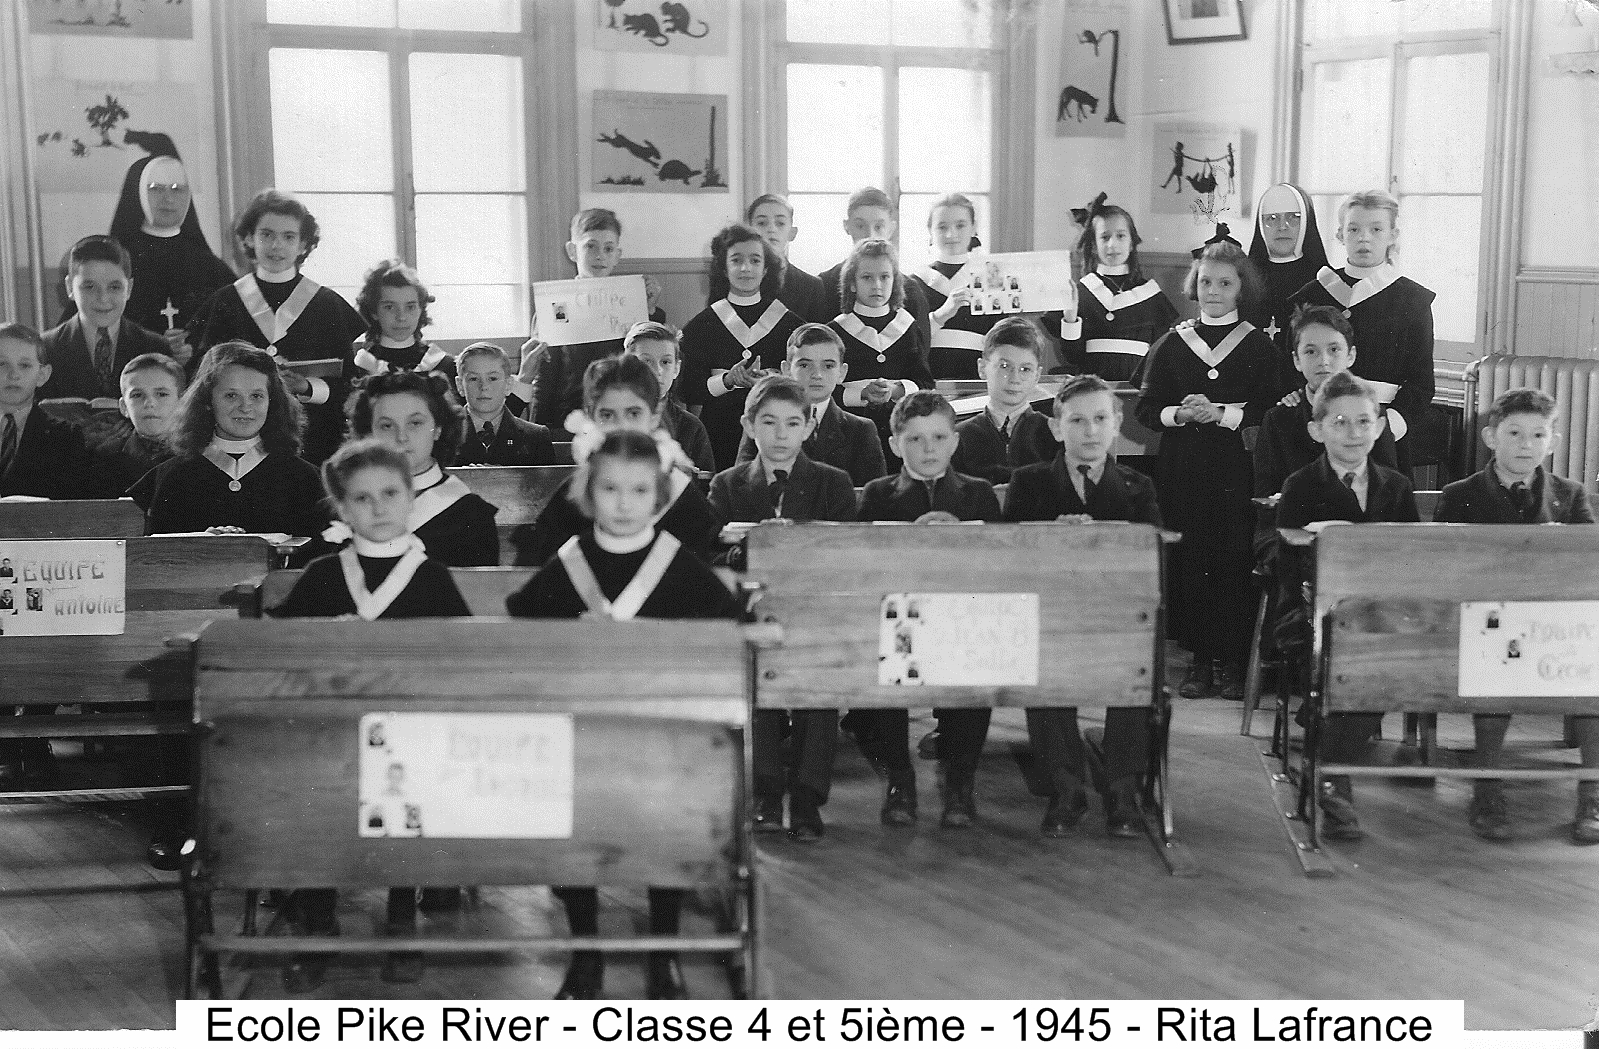 Classe 4e 5e Ecole Pike River vers 1945 Rita Lafrance